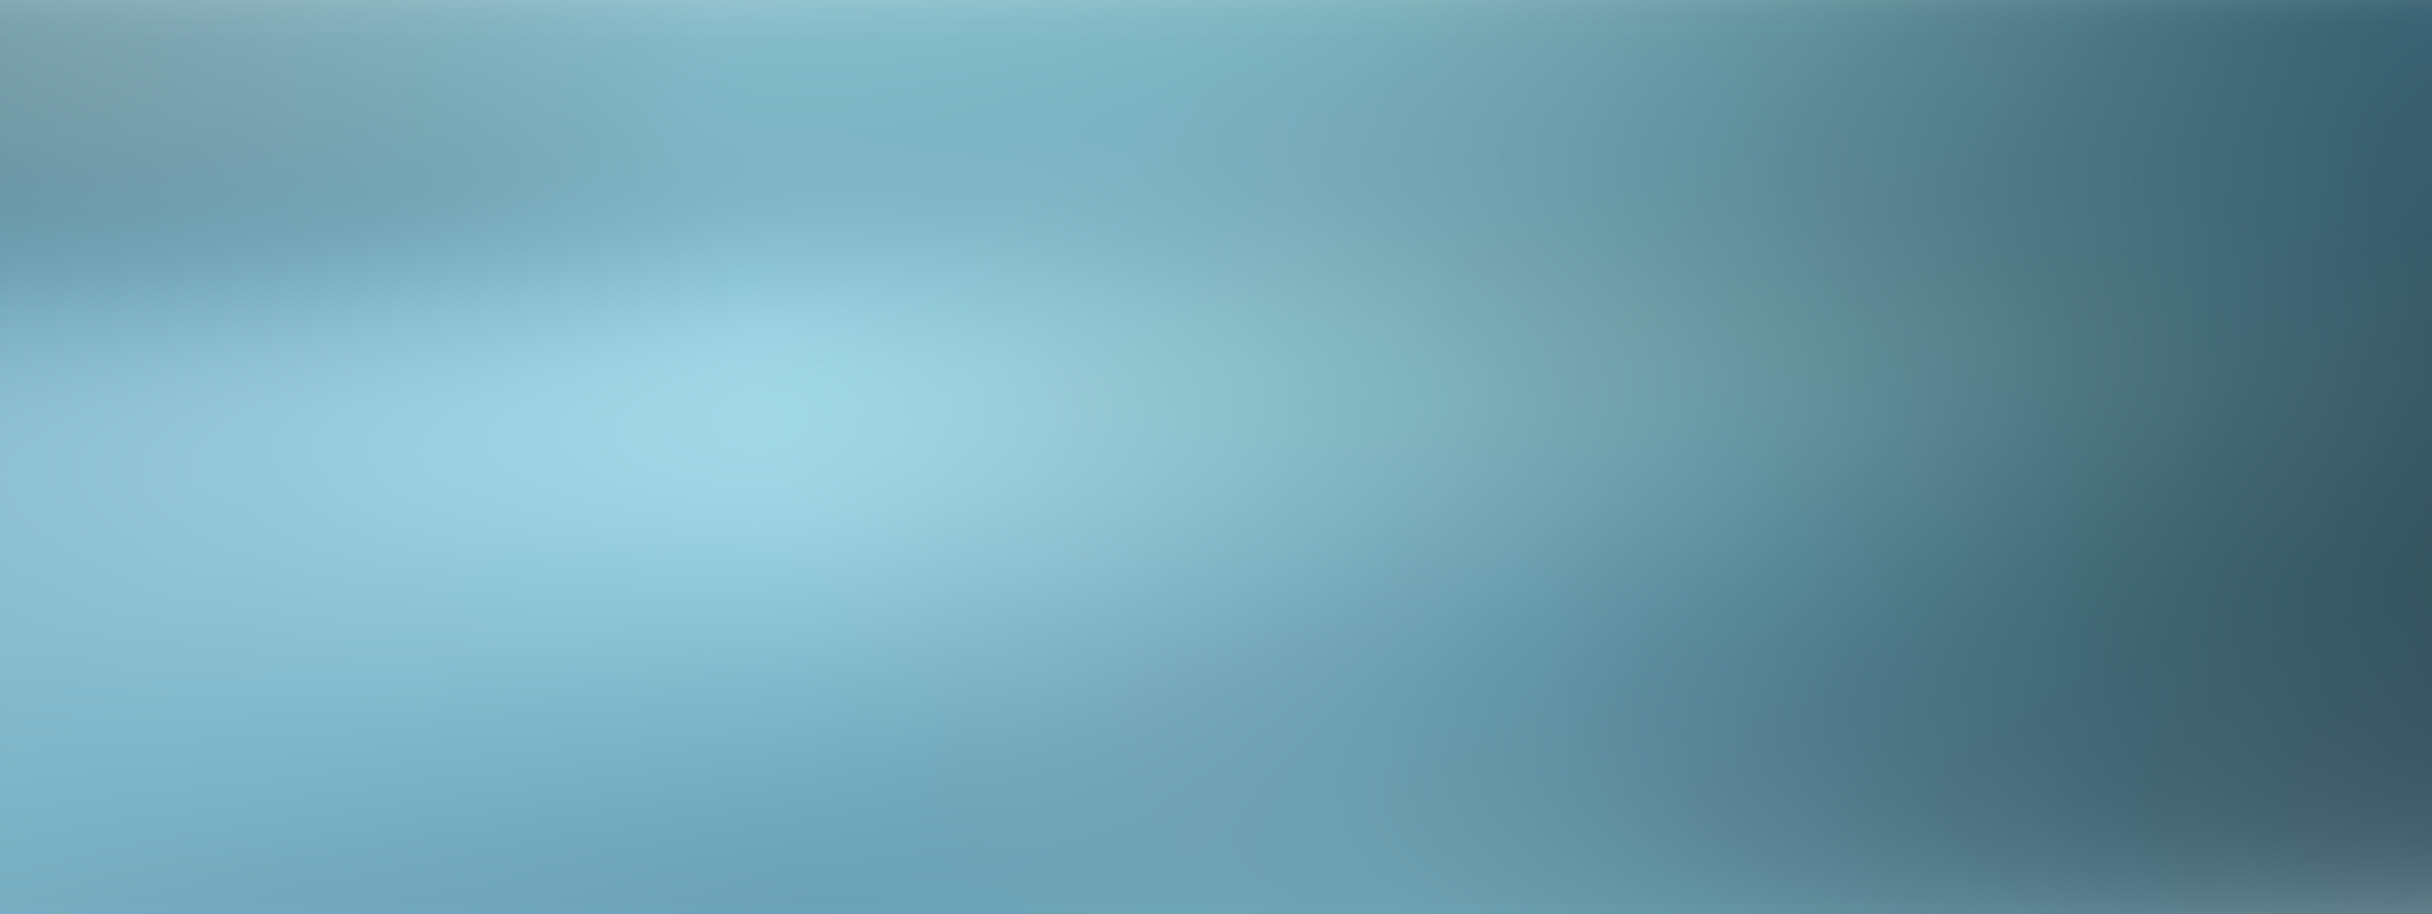 sfondo sliser azzurra.jpg